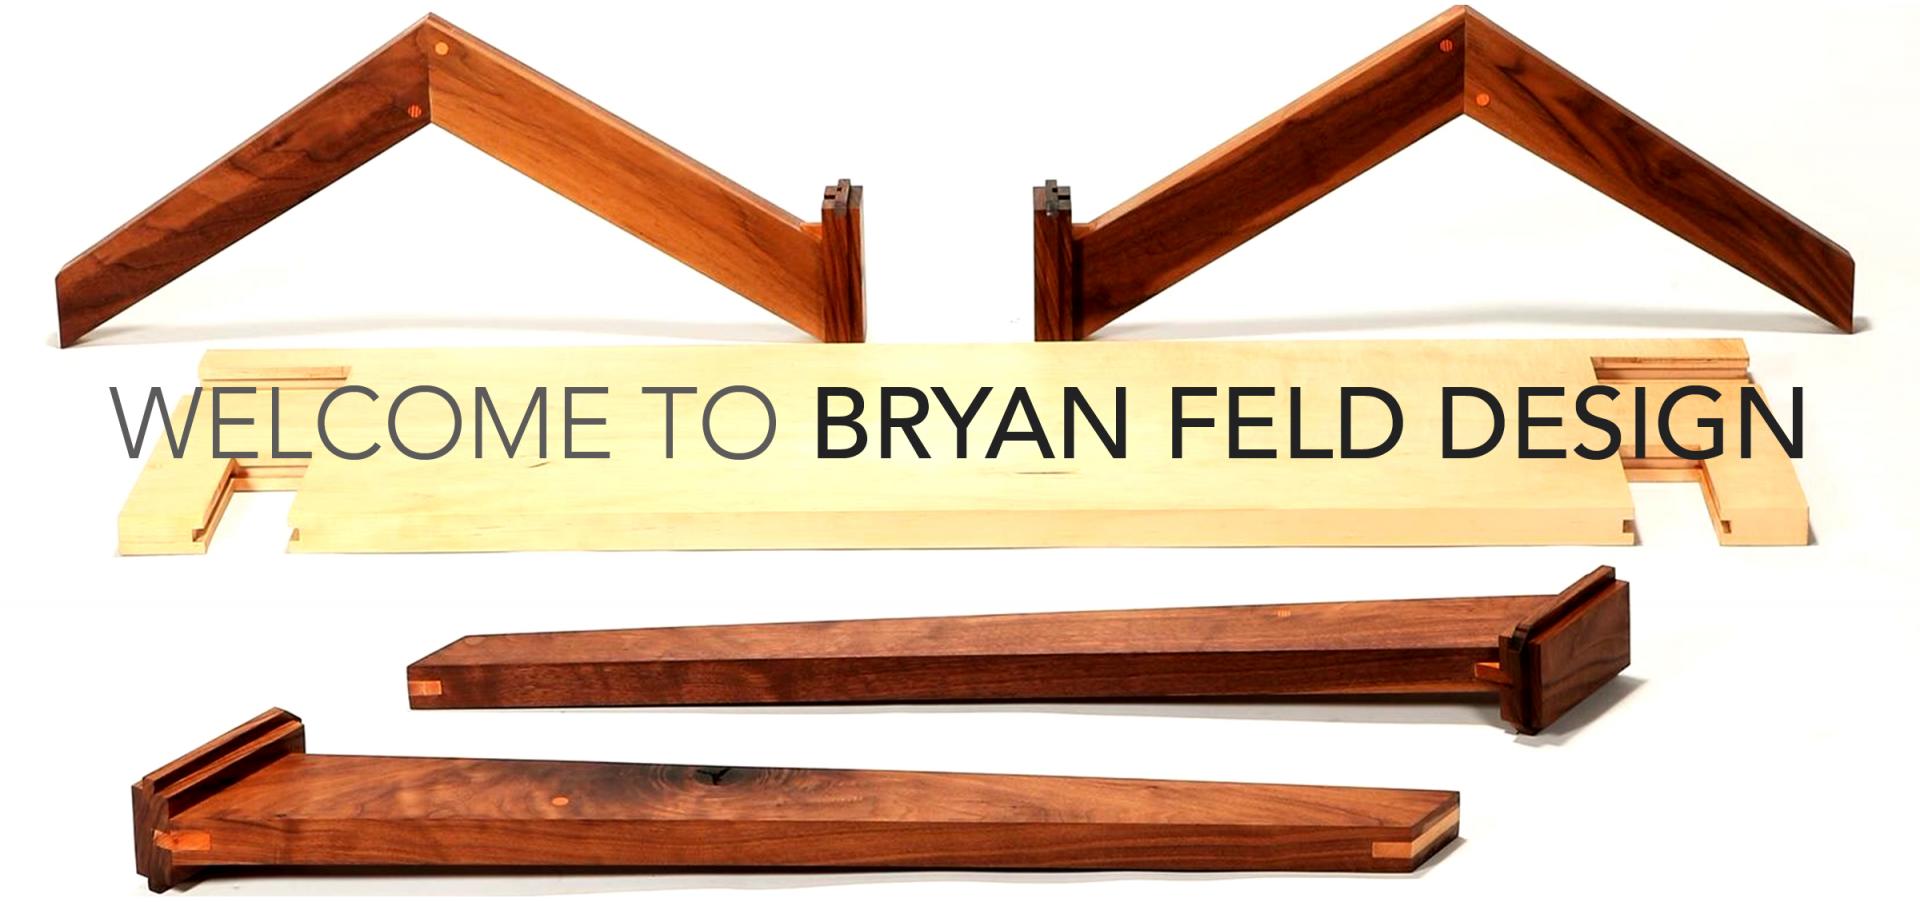 Bryan Feld Design